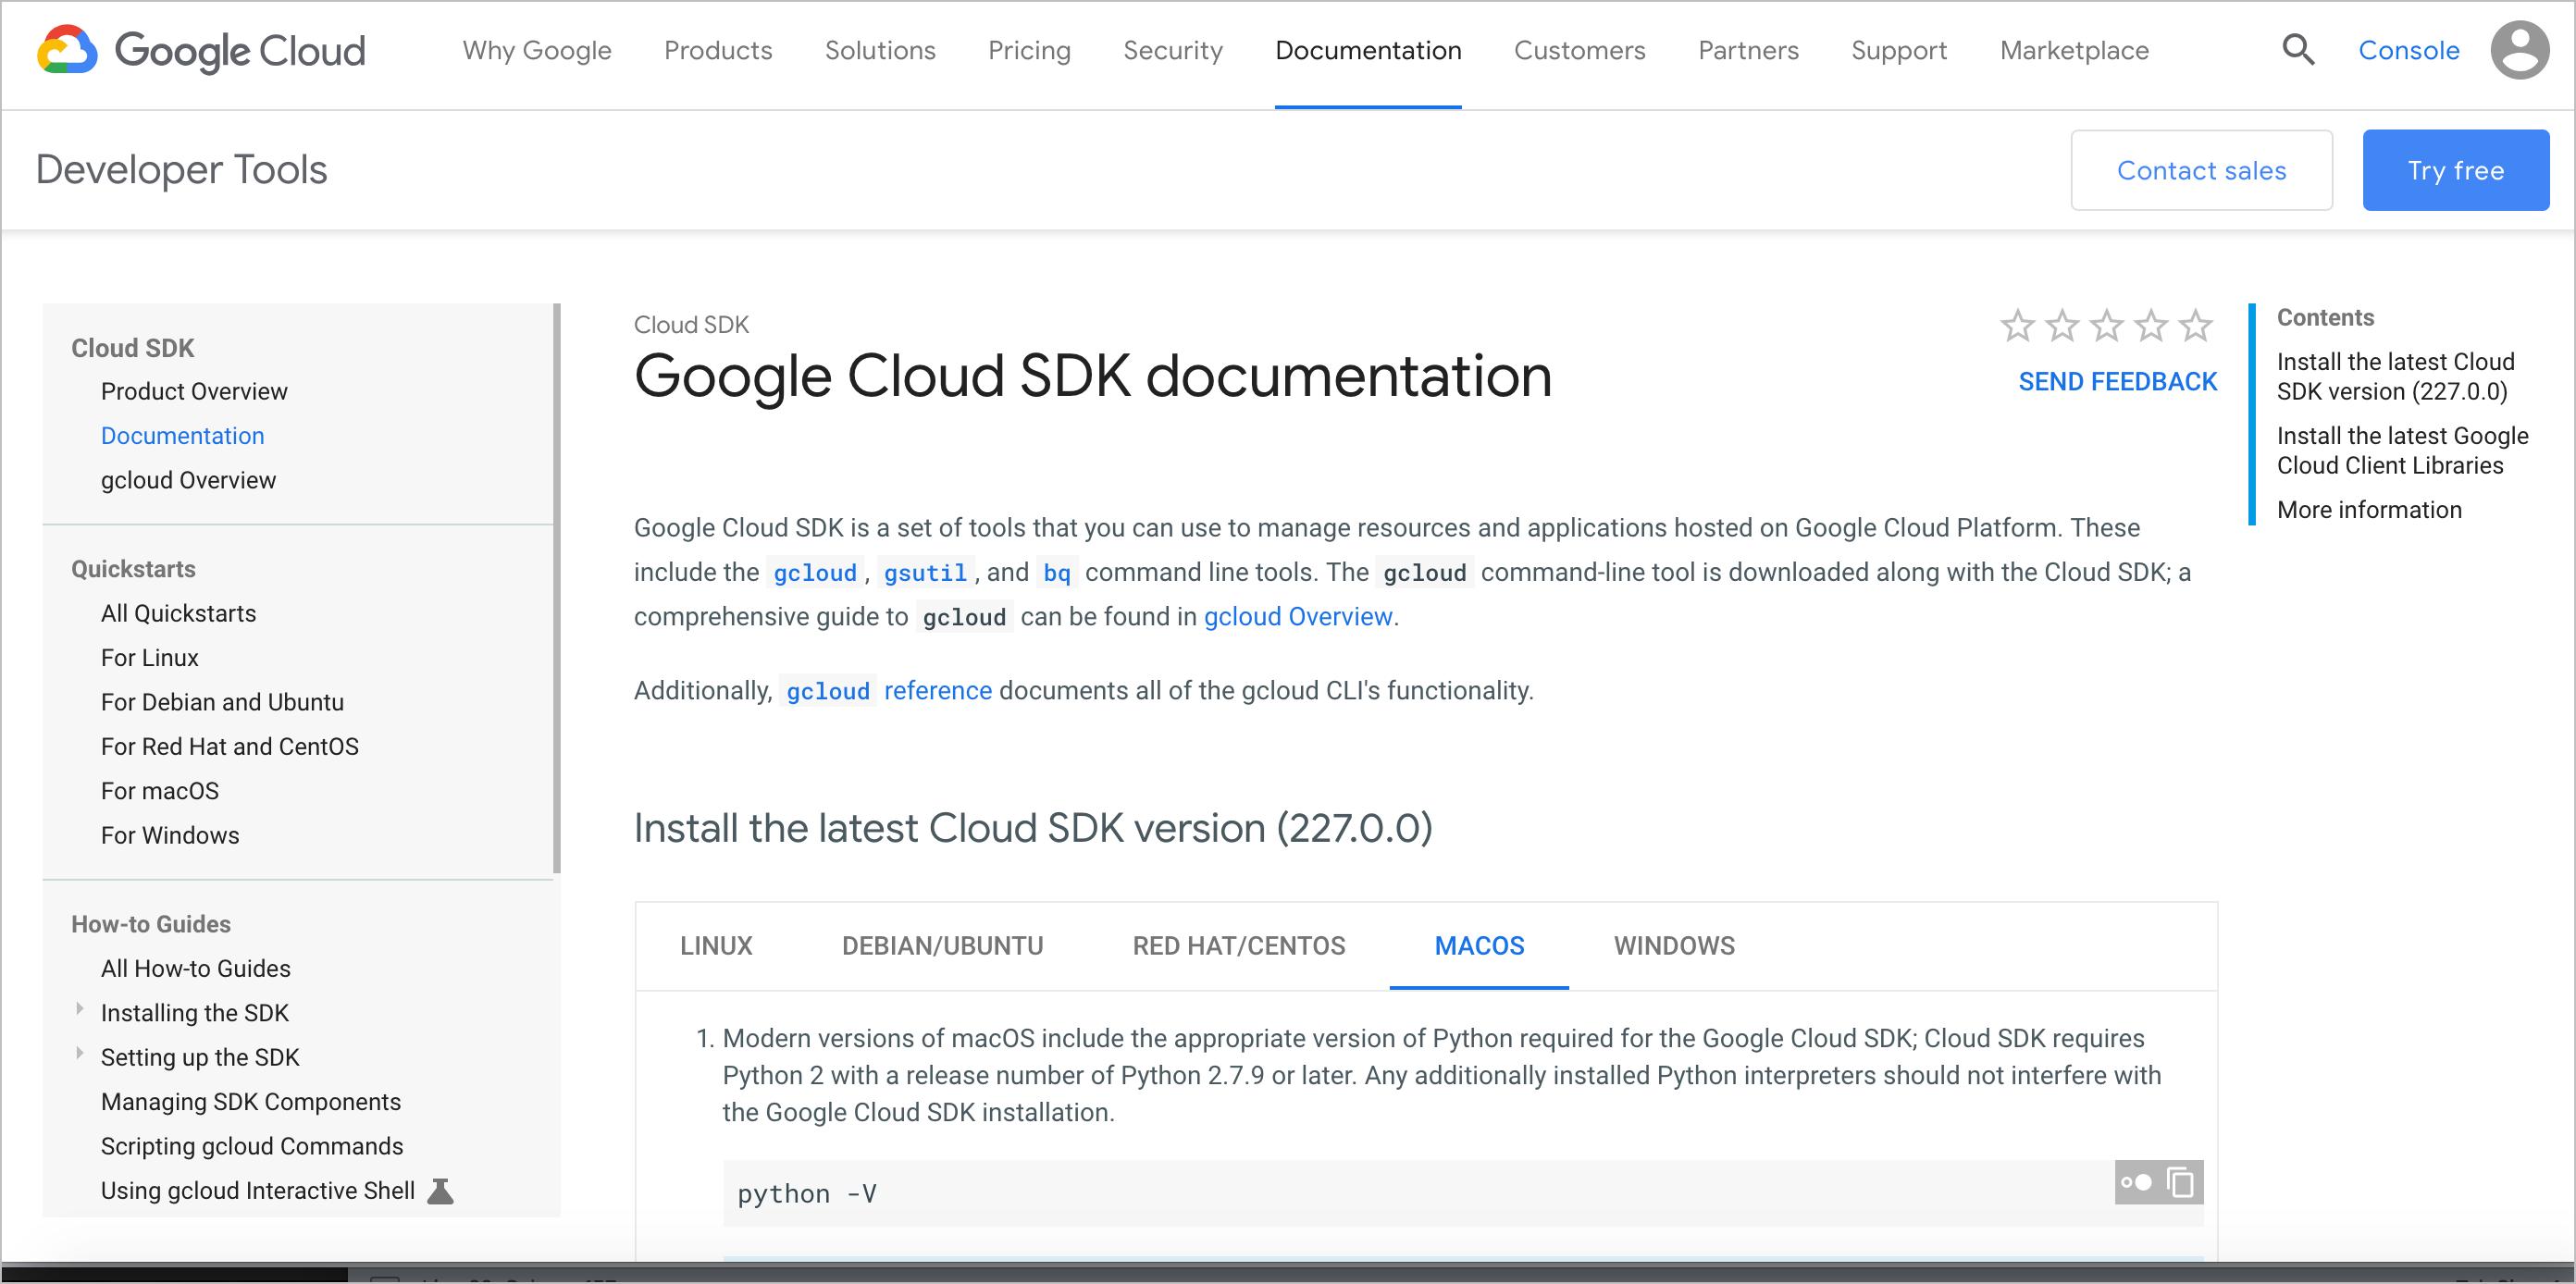 Google Cloud SDK documentation